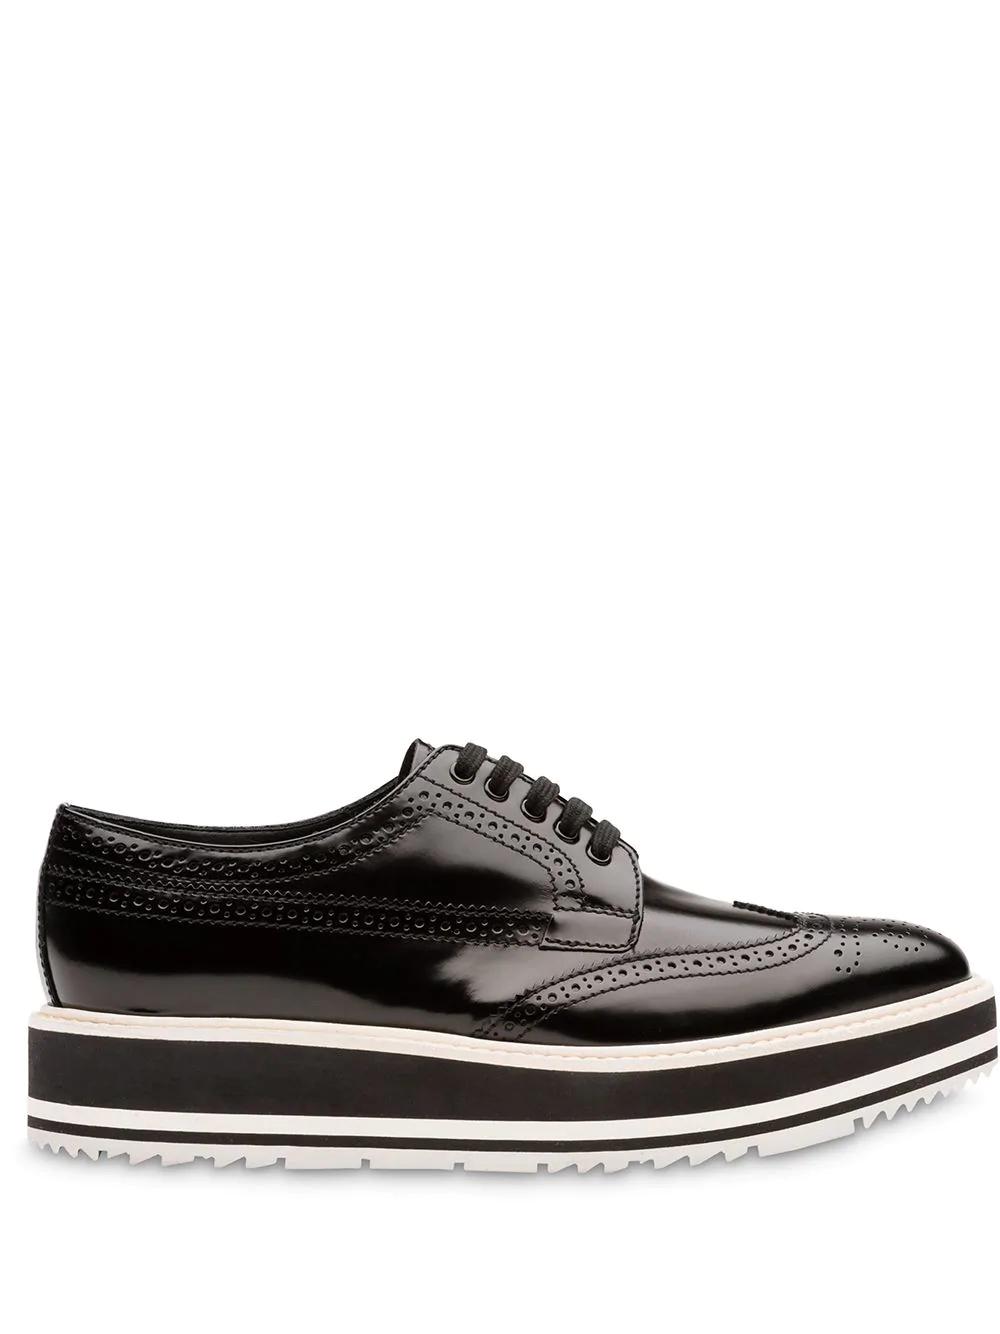 6194d17b037 Prada Platform Derby Shoes - Black